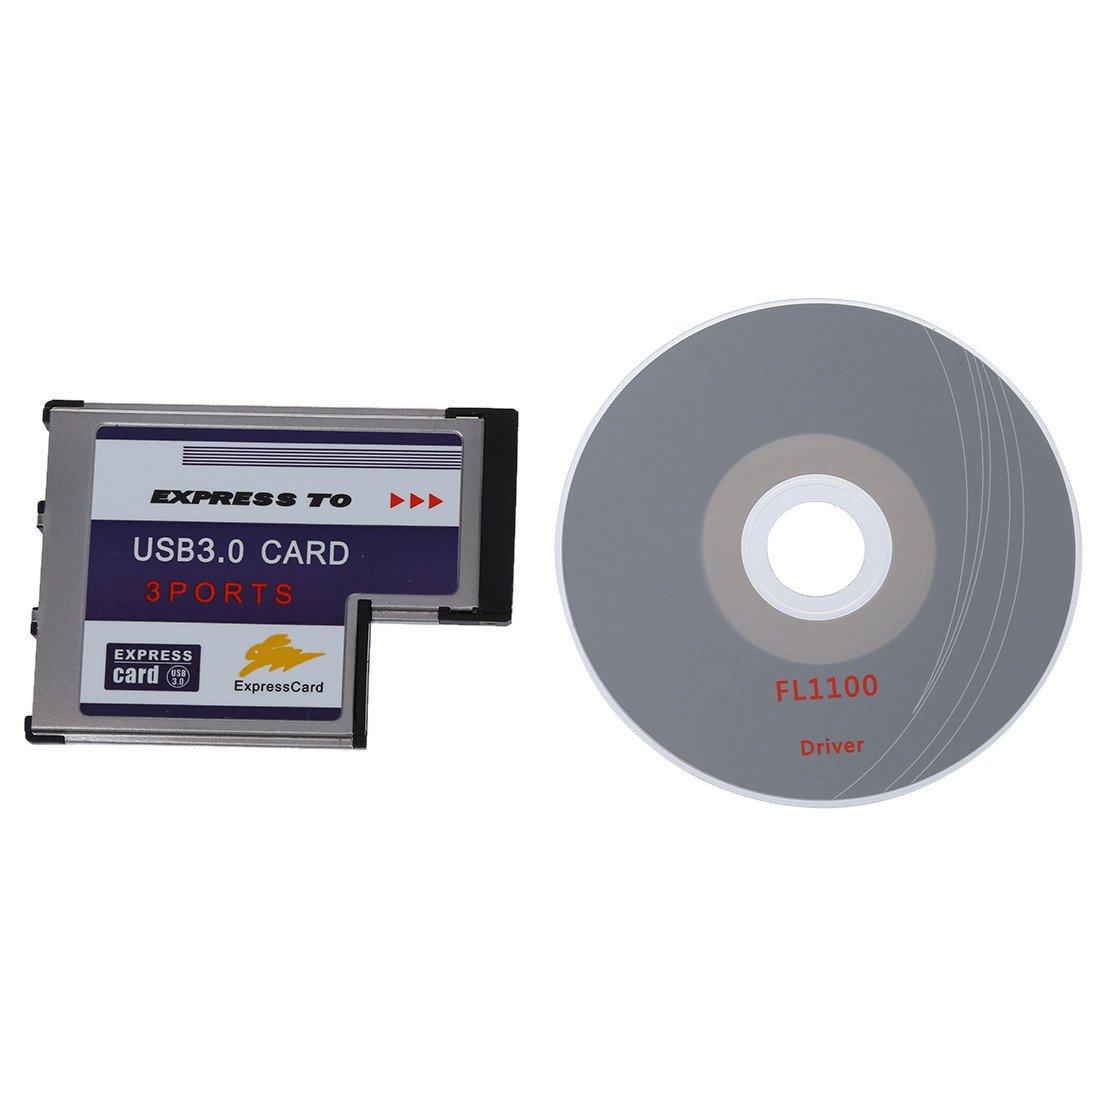 3 USB 3.0 puerto expreso Tarjeta 54mm PCMCIA Express Card para el ordenador portatil NUEVO R TOOGOO